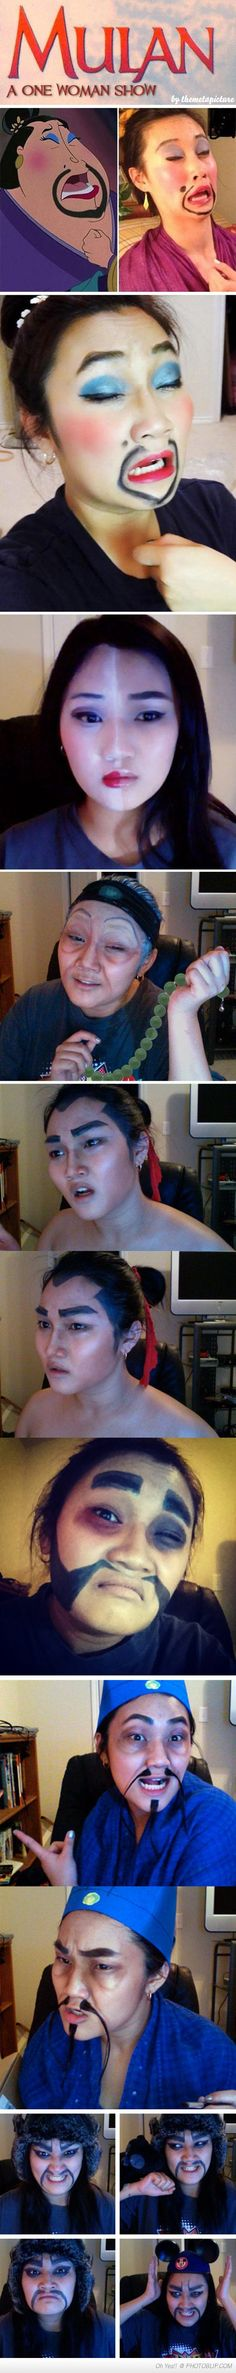 Mulan: A One Woman Show woah.